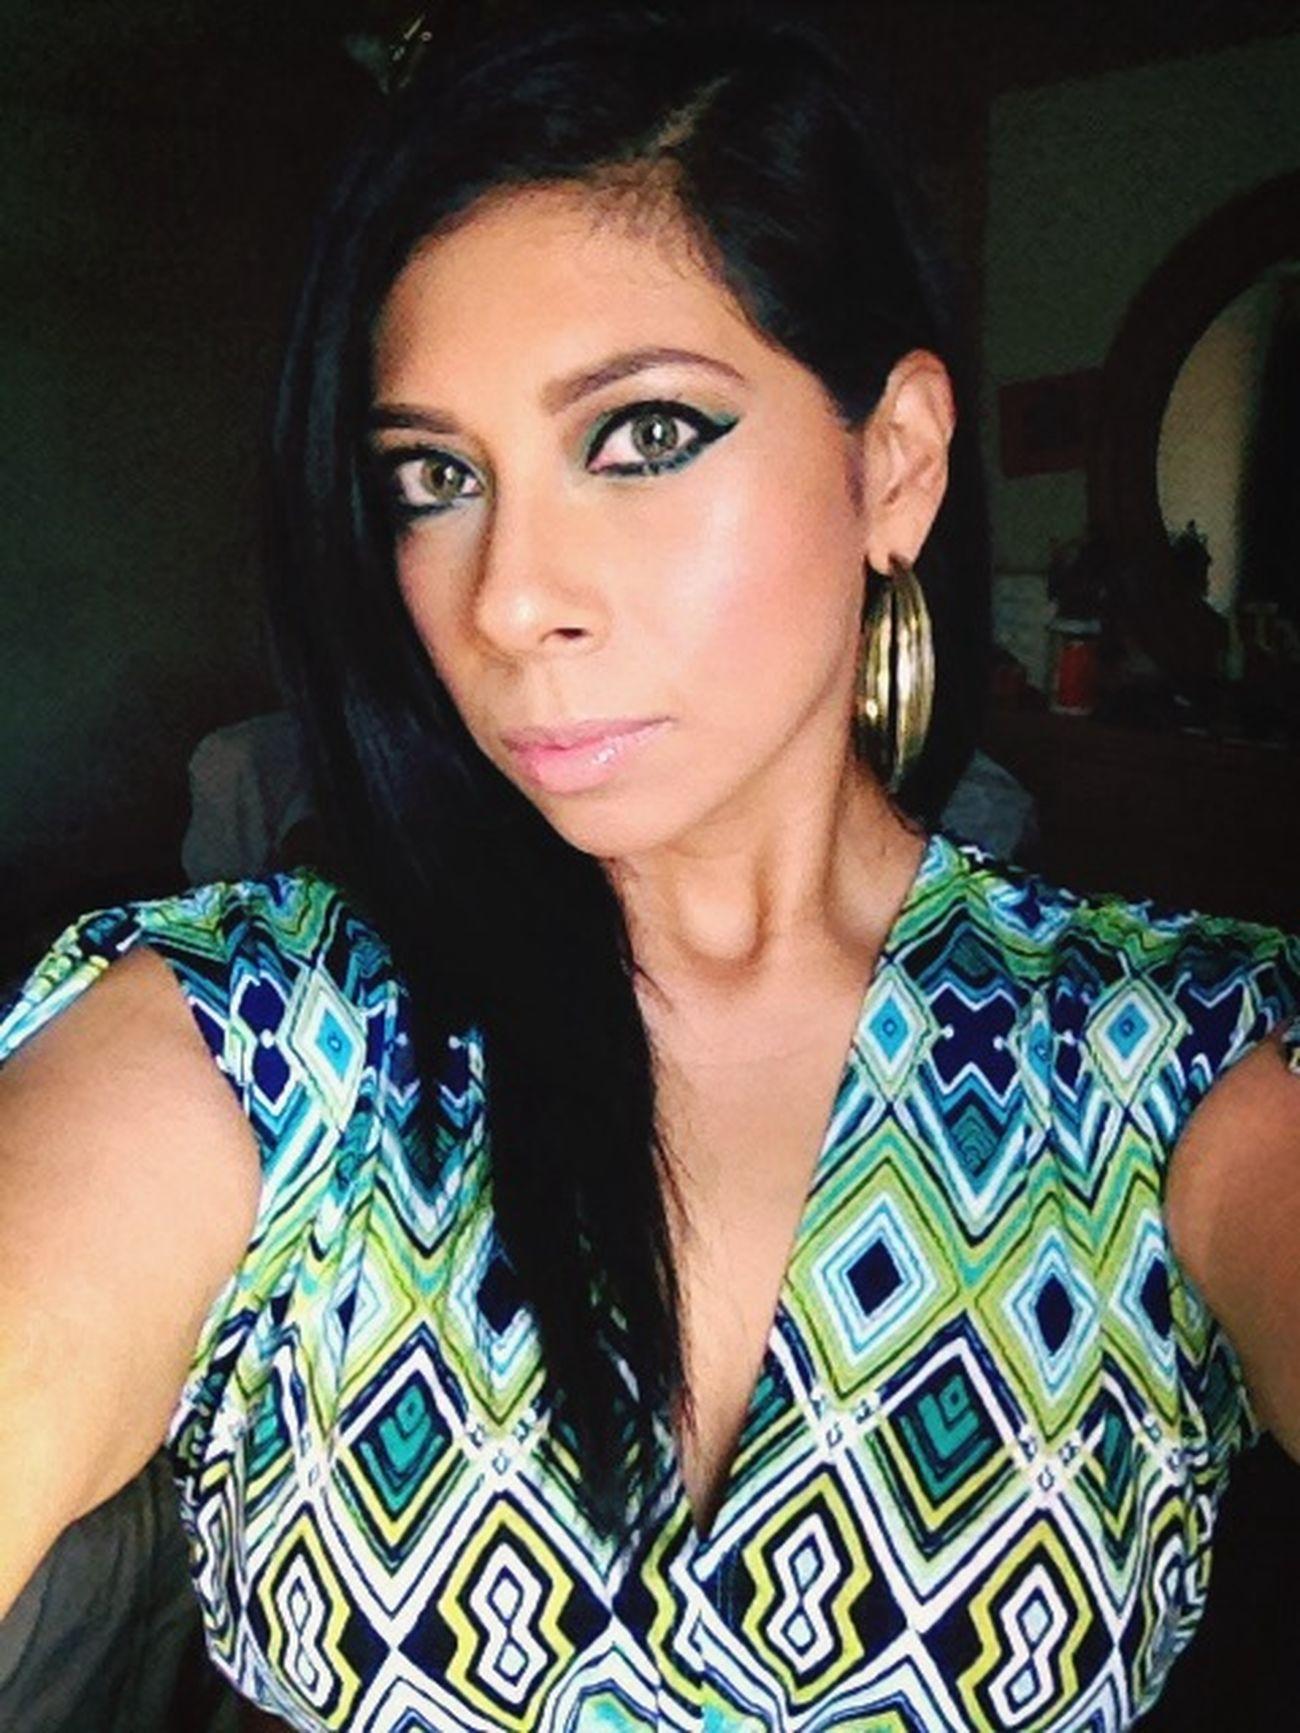 Selfie ✌ Simply Me ❤ Eye #eyeshadow #eyelashes #eyebrows #instabeauty Makeup